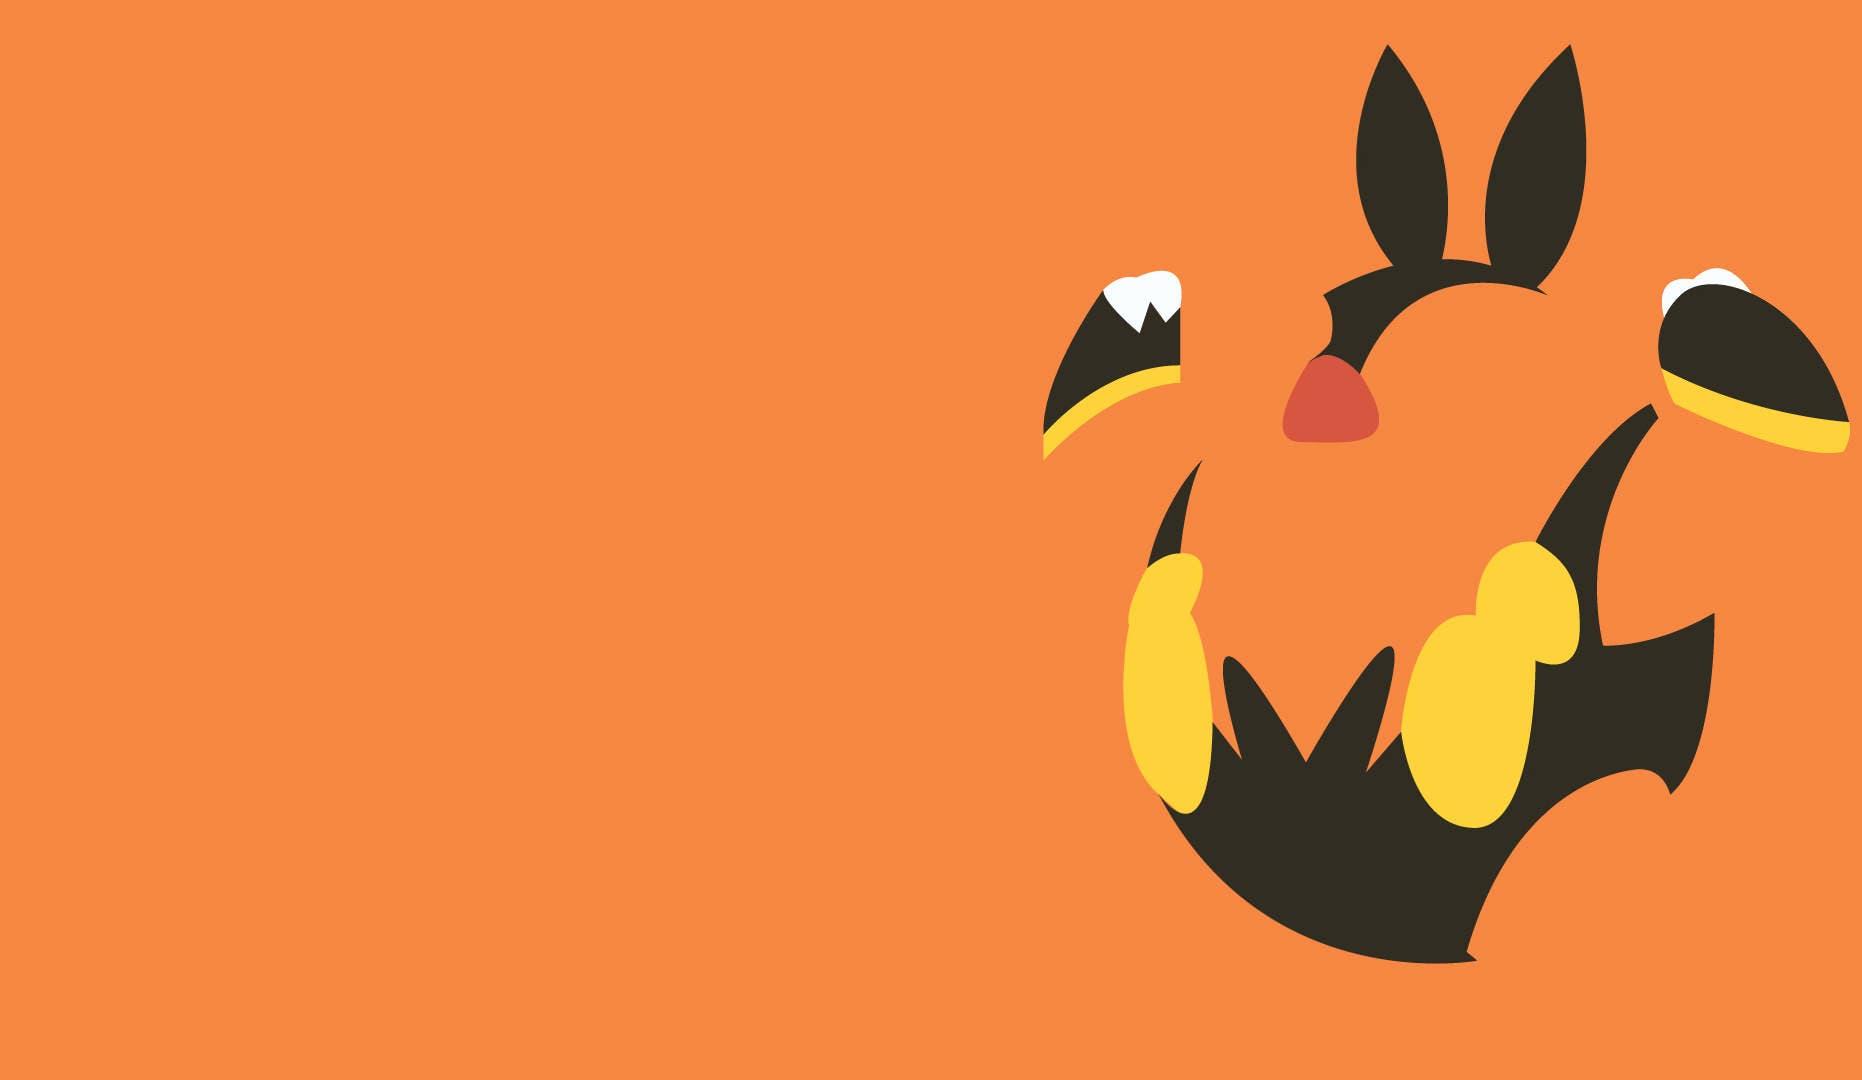 El Safari y Pignite llegan a 'Pokémon Shuffle'